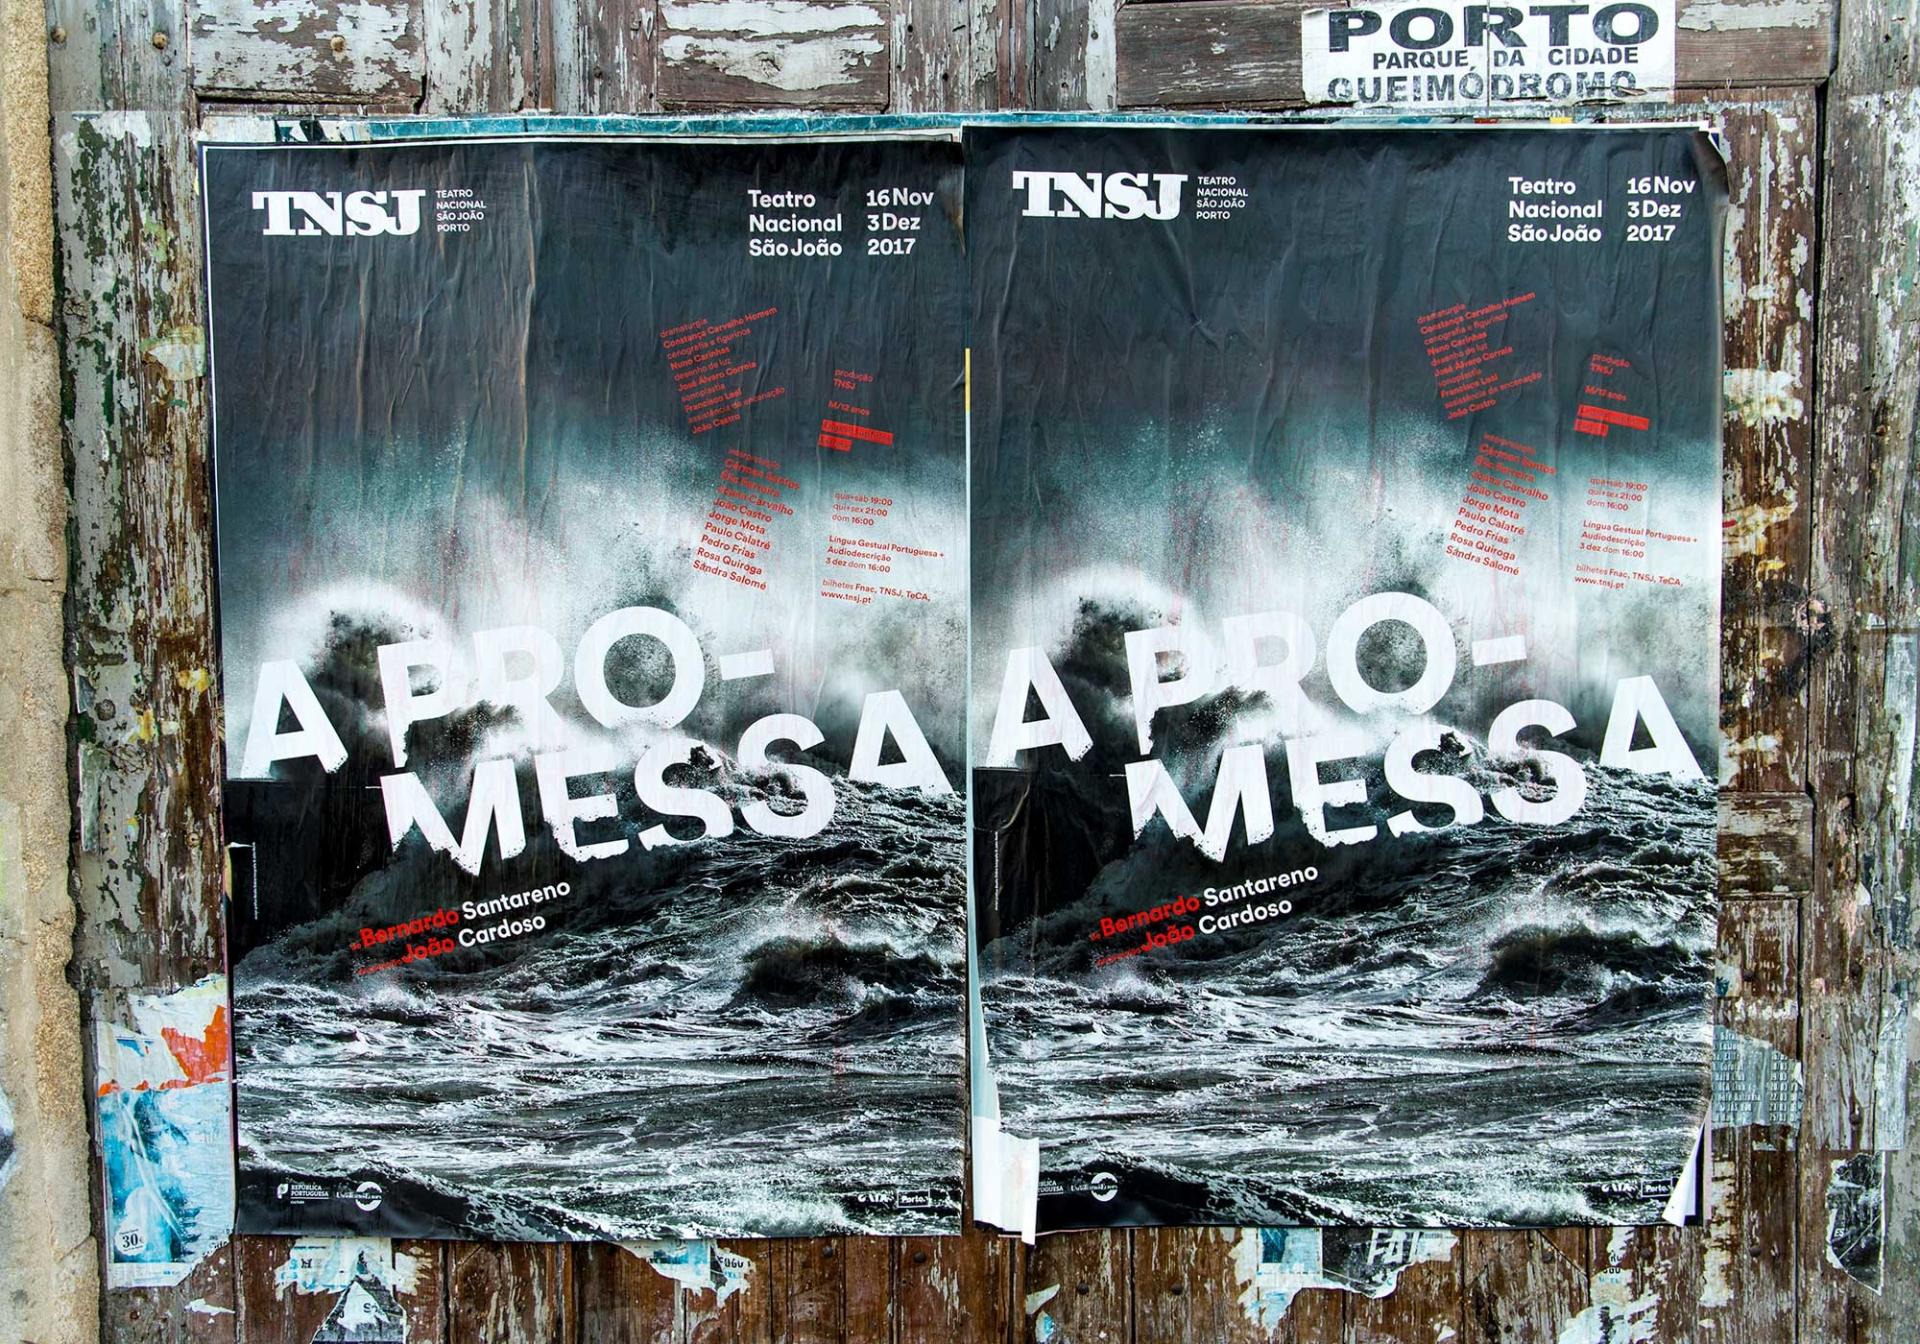 São João National Theatre Posters 2017-2018 Image:7 dobra-tnsj-Promessa